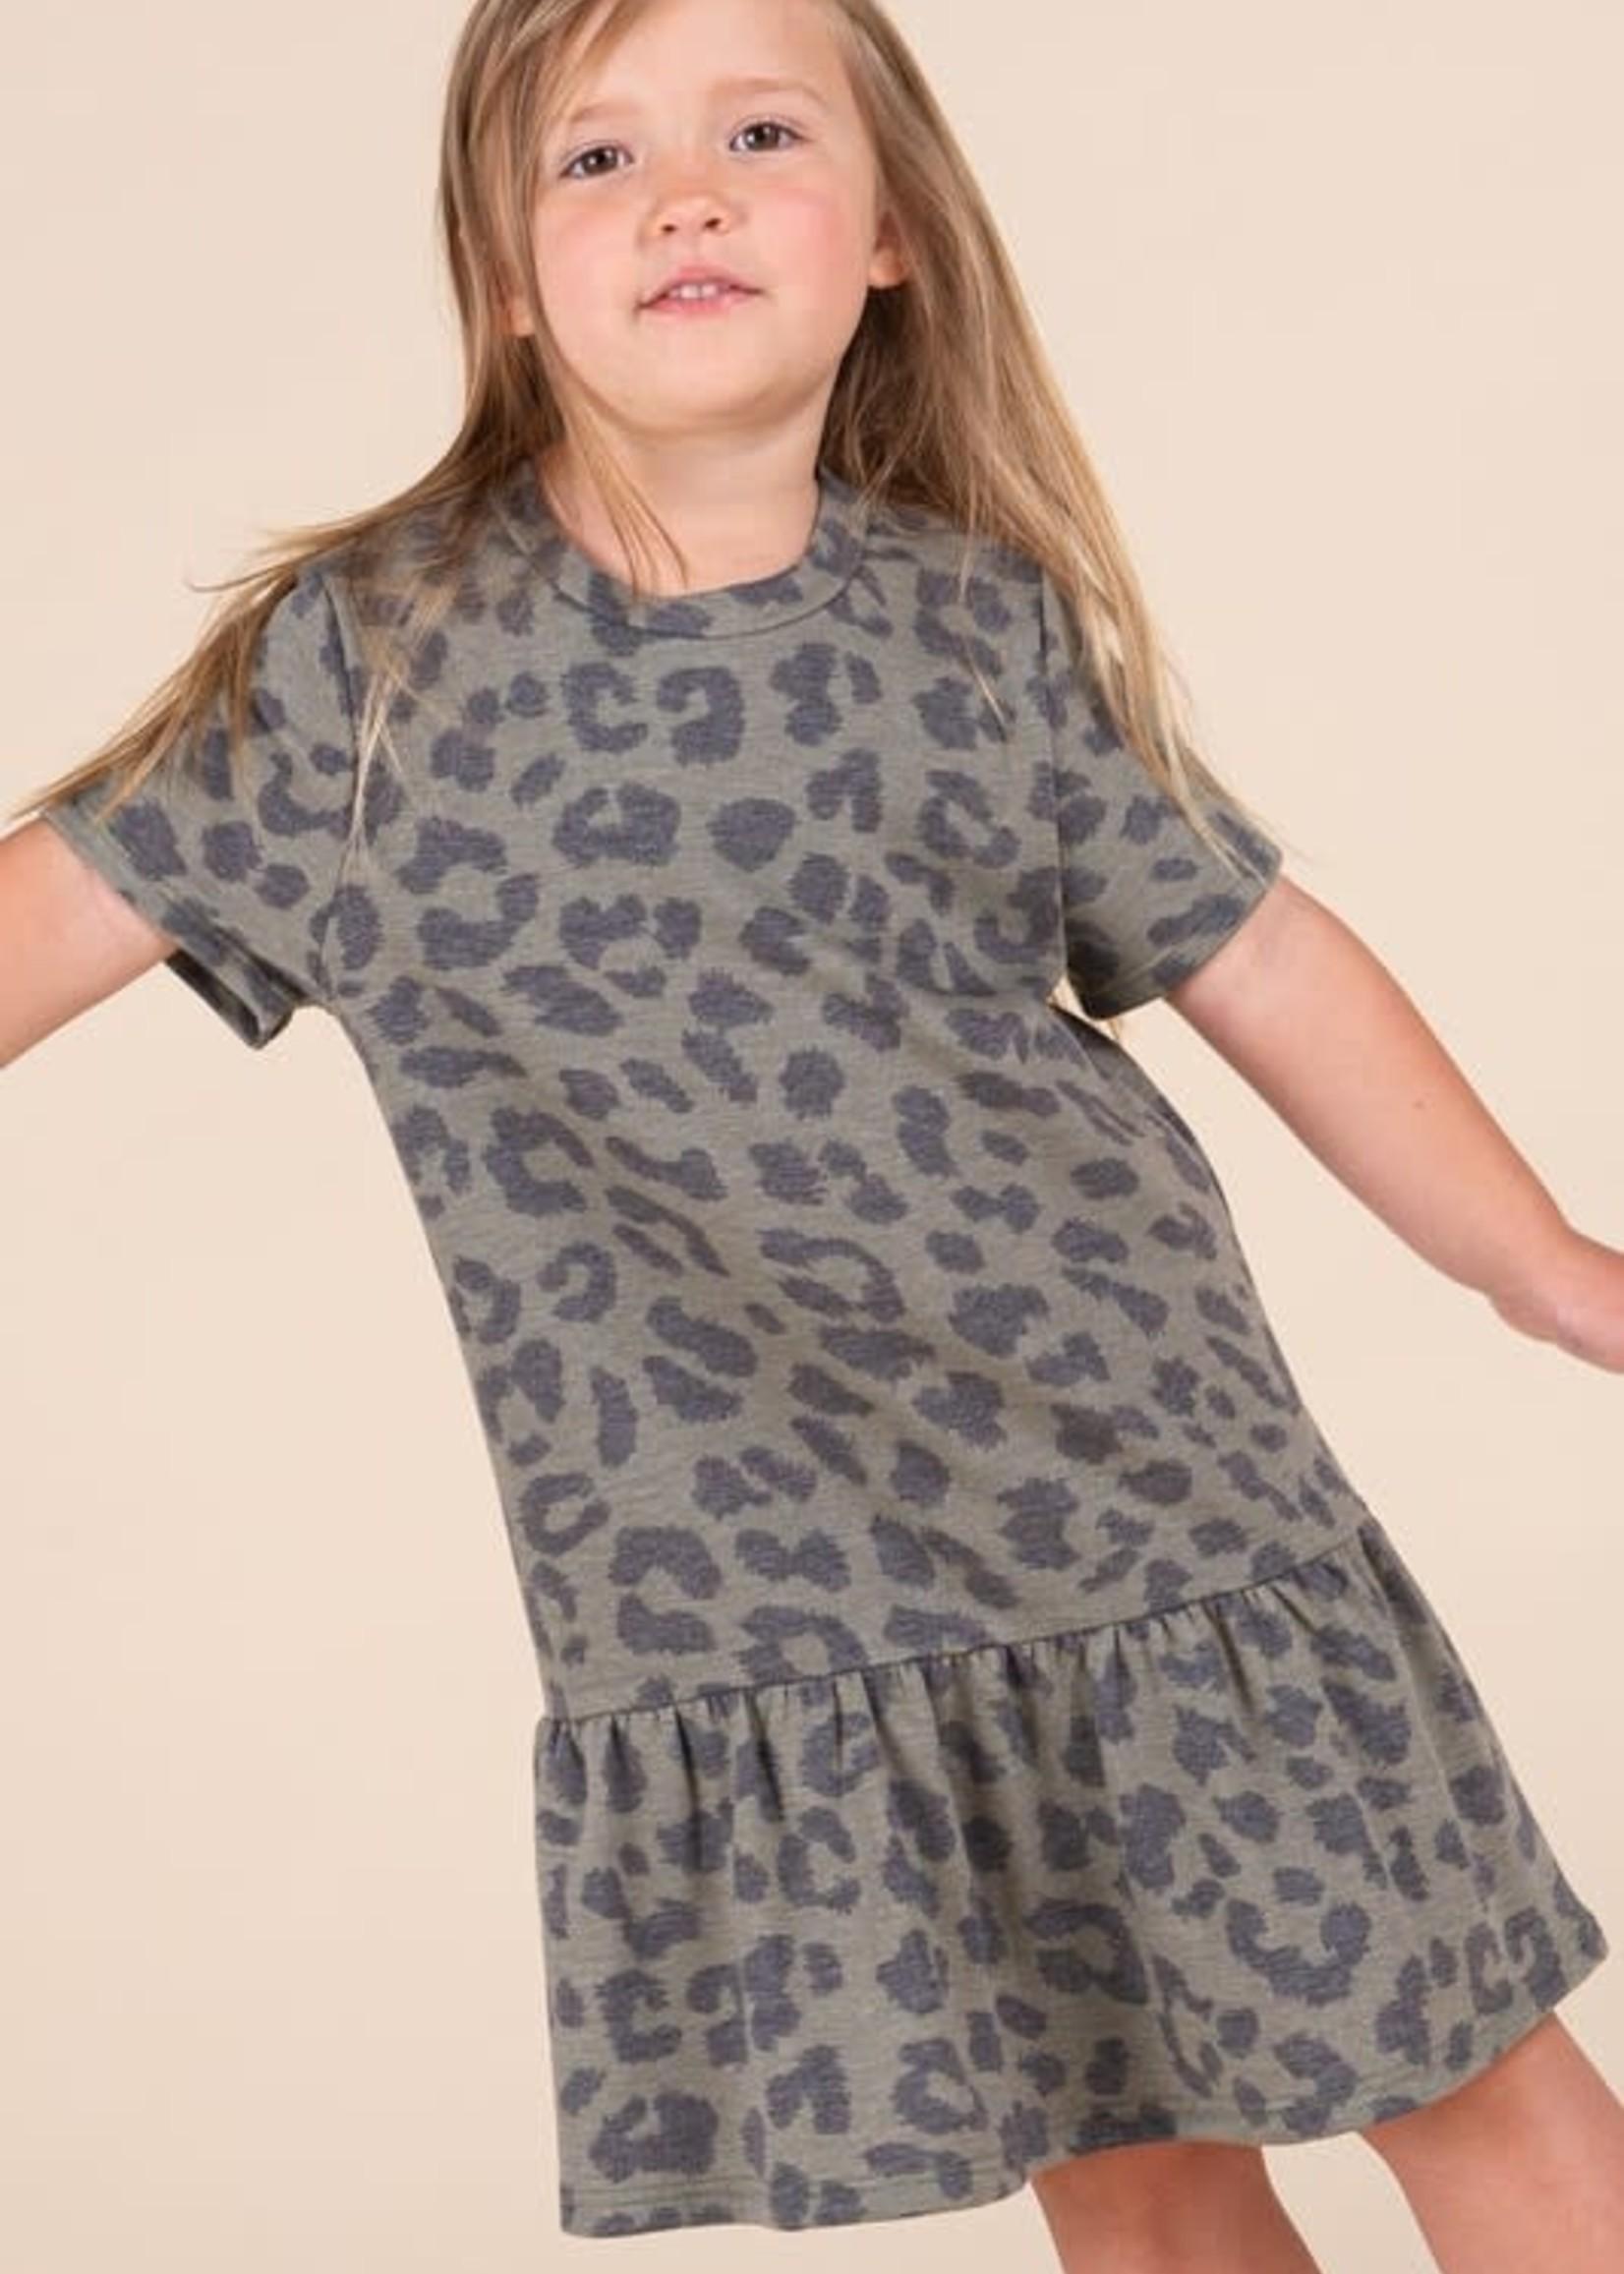 Animal Print Peplum Style Dress